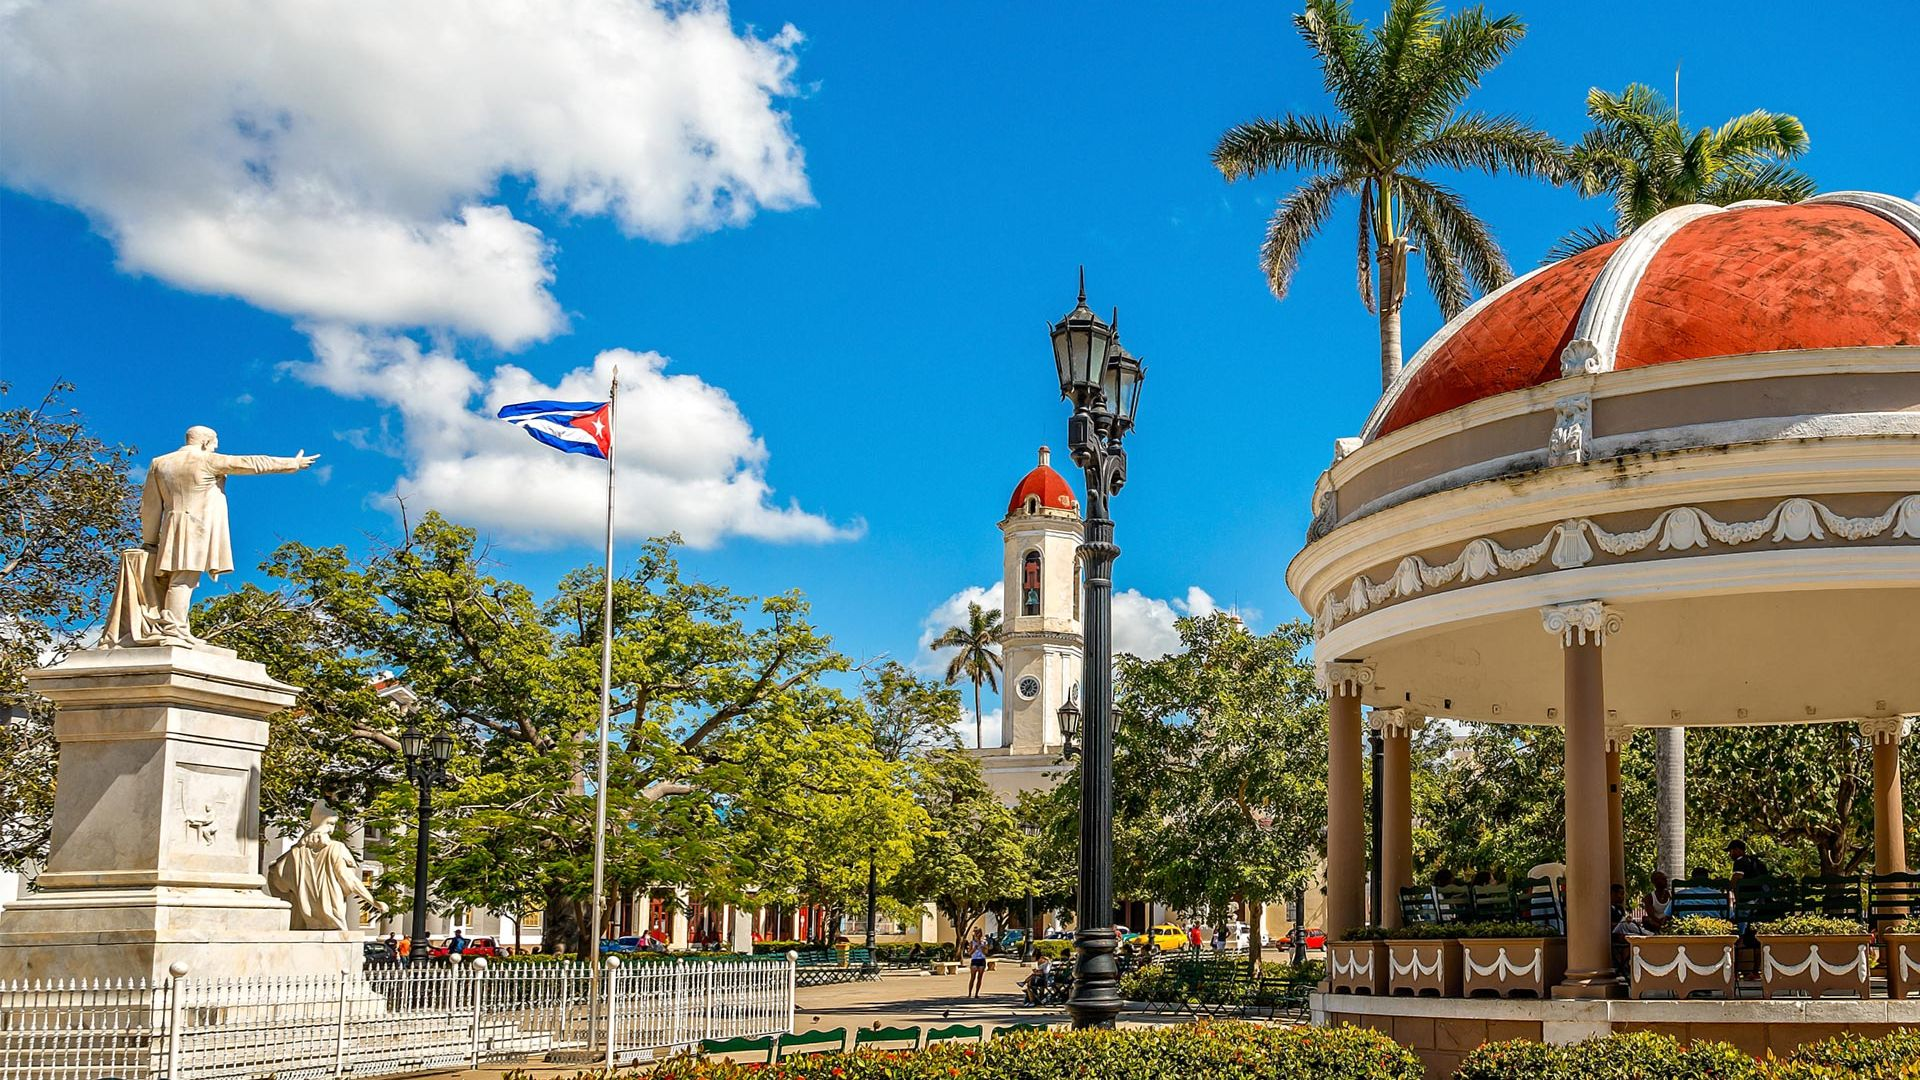 Revelion 2022 - Sejur Havana & plaja Varadero, Cuba, 9 zile